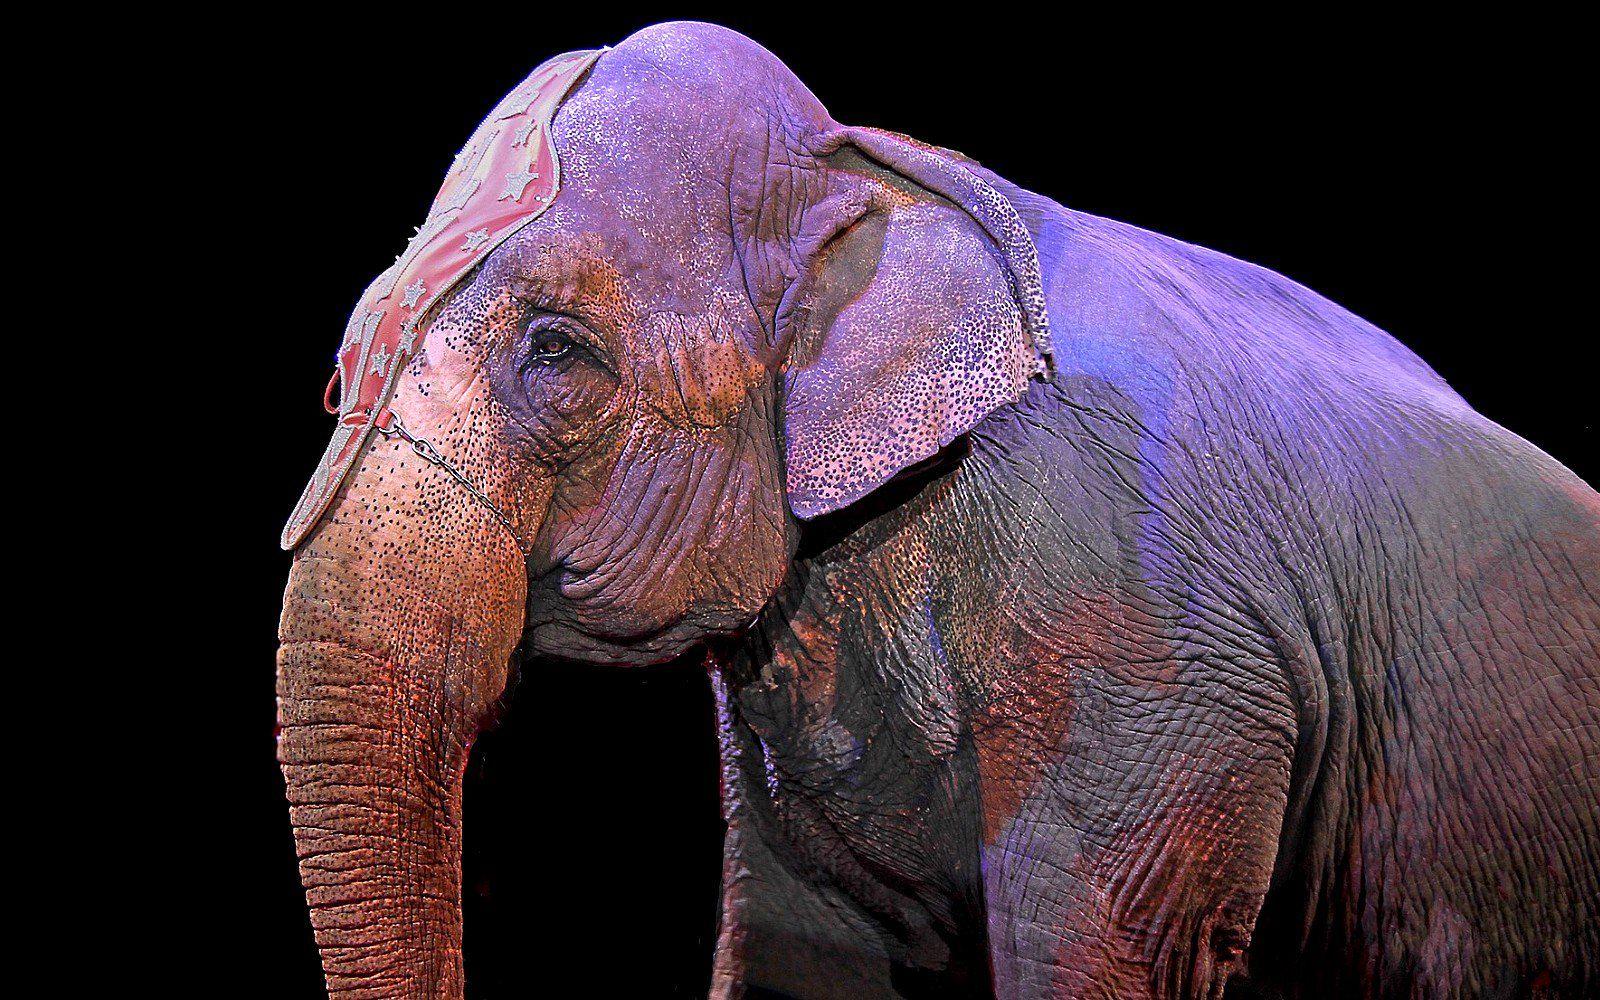 Australia S Largest Touring Circus Drops Elephant Acts Thanks To Public Outcry Elephant Sanctuary Elephant Animals